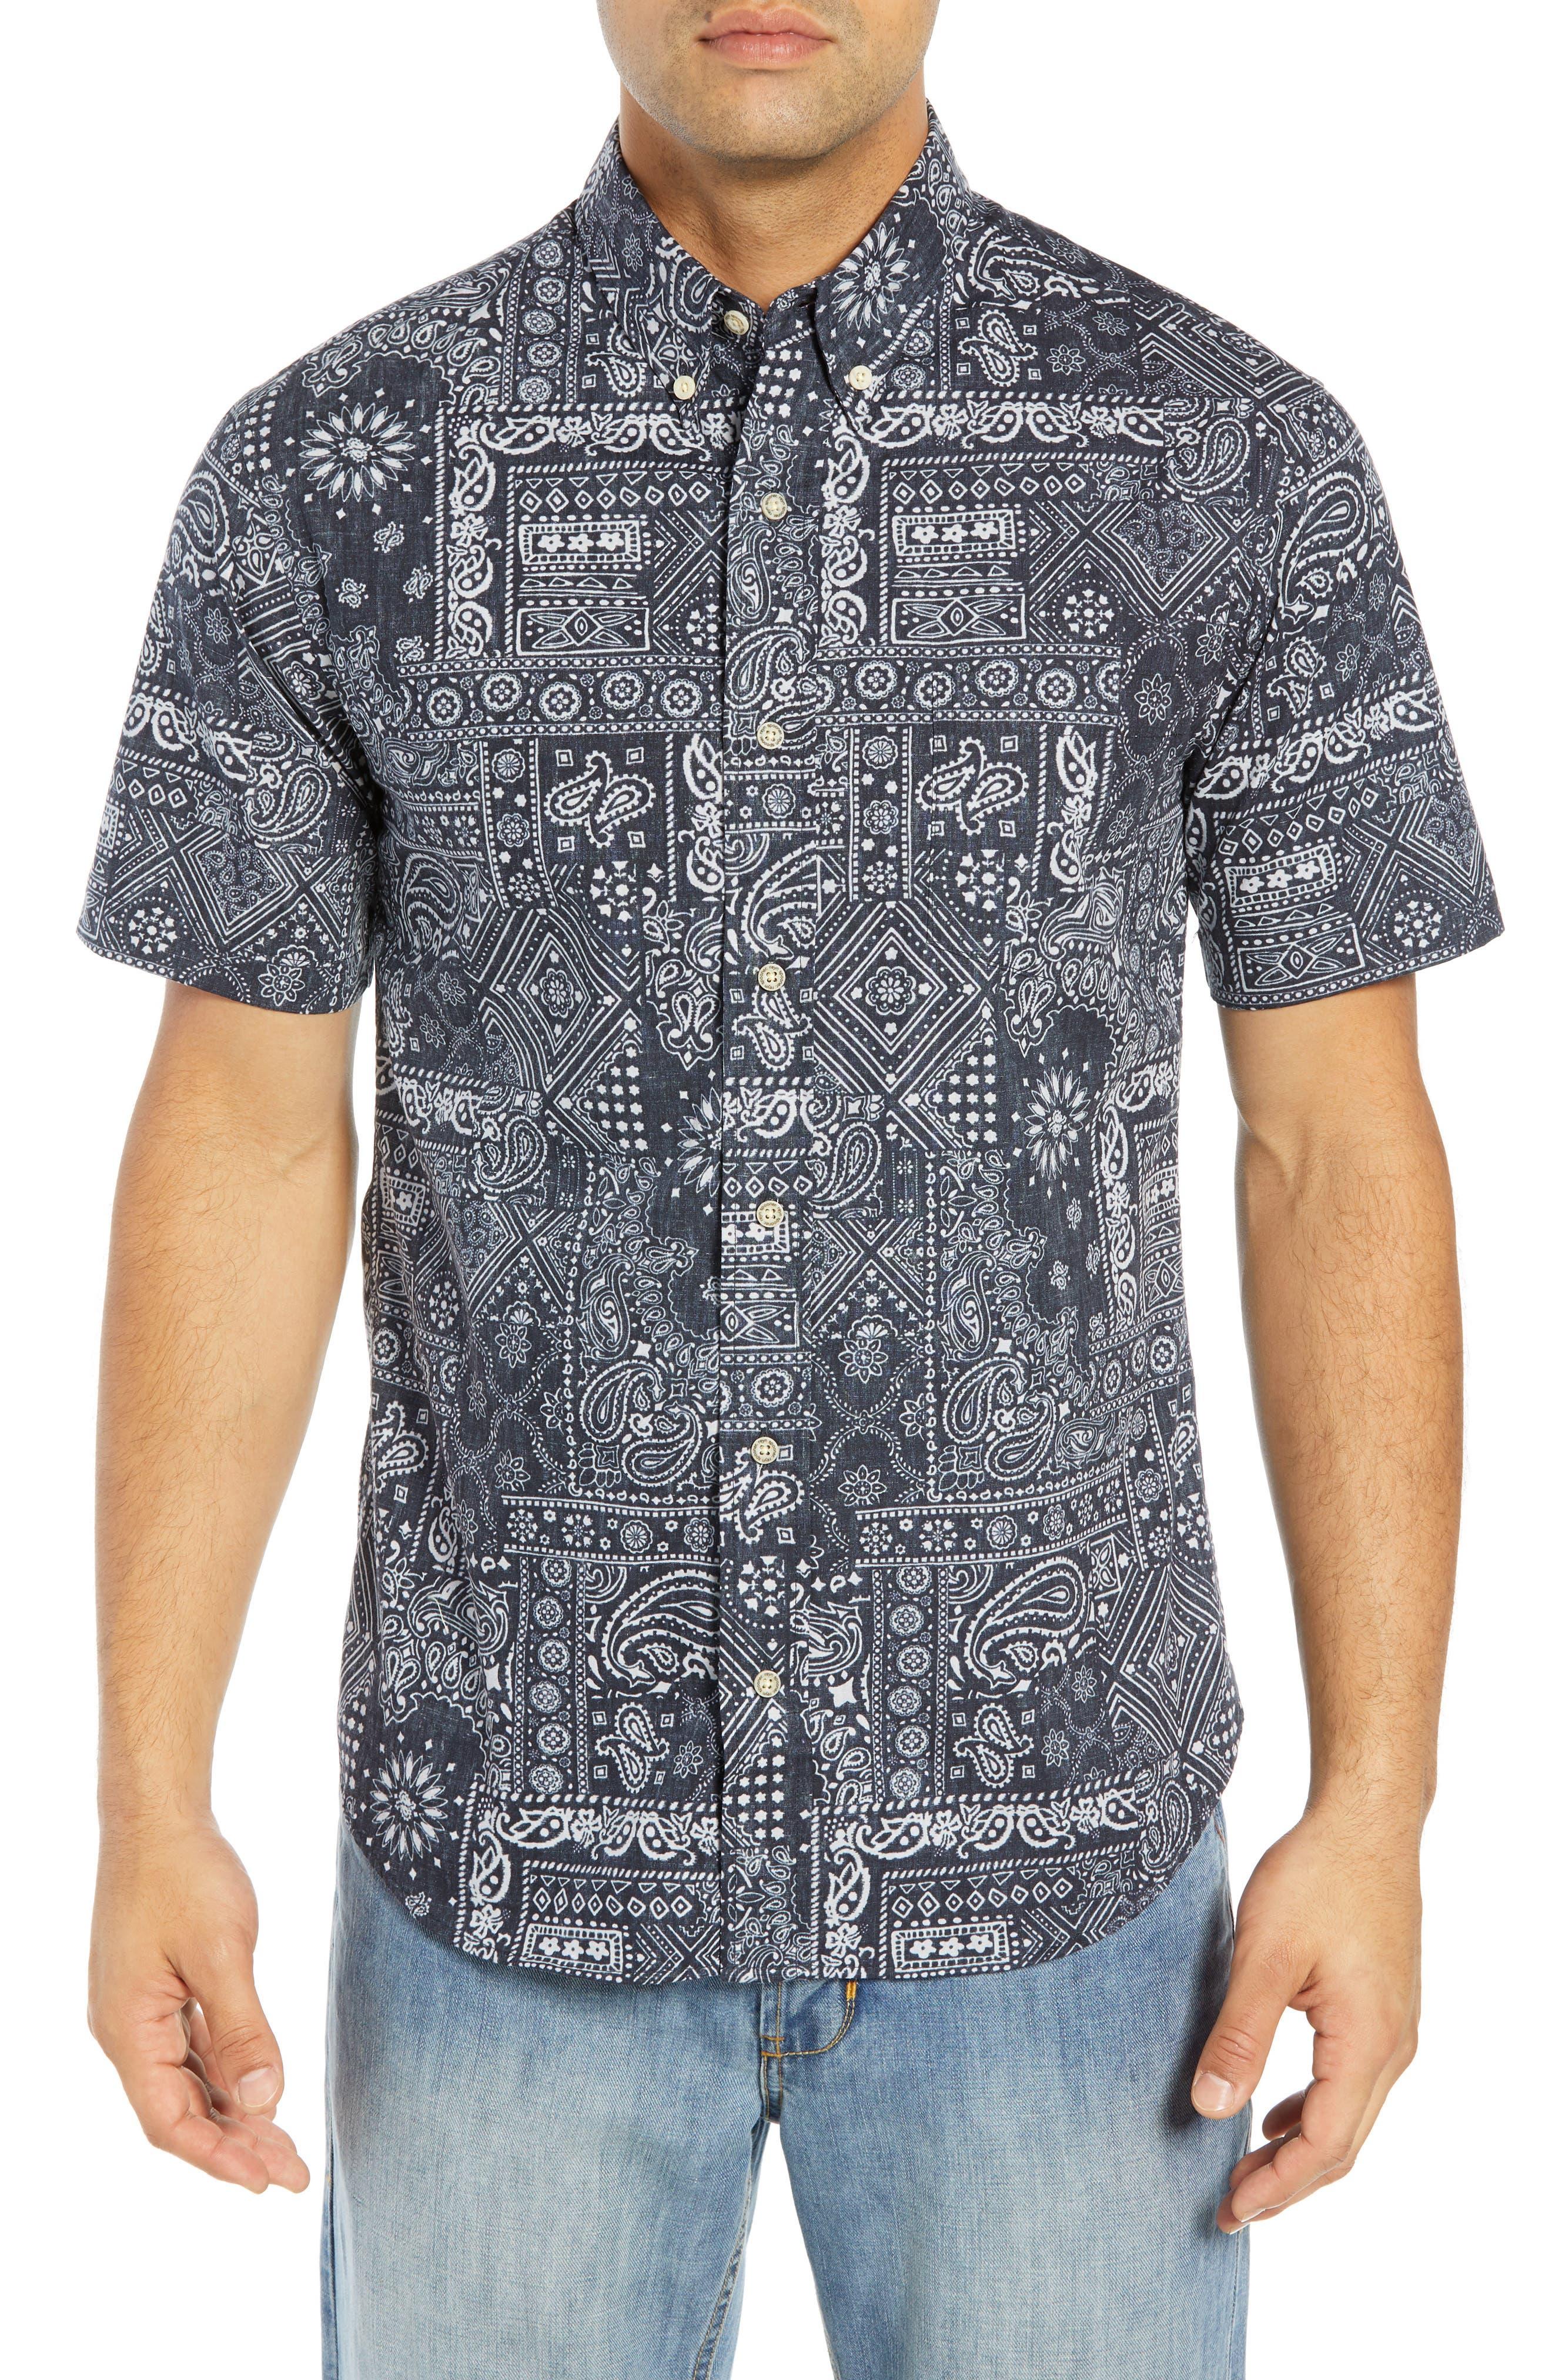 REYN SPOONER, Aloha Bandana Regular Fit Sport Shirt, Main thumbnail 1, color, 001